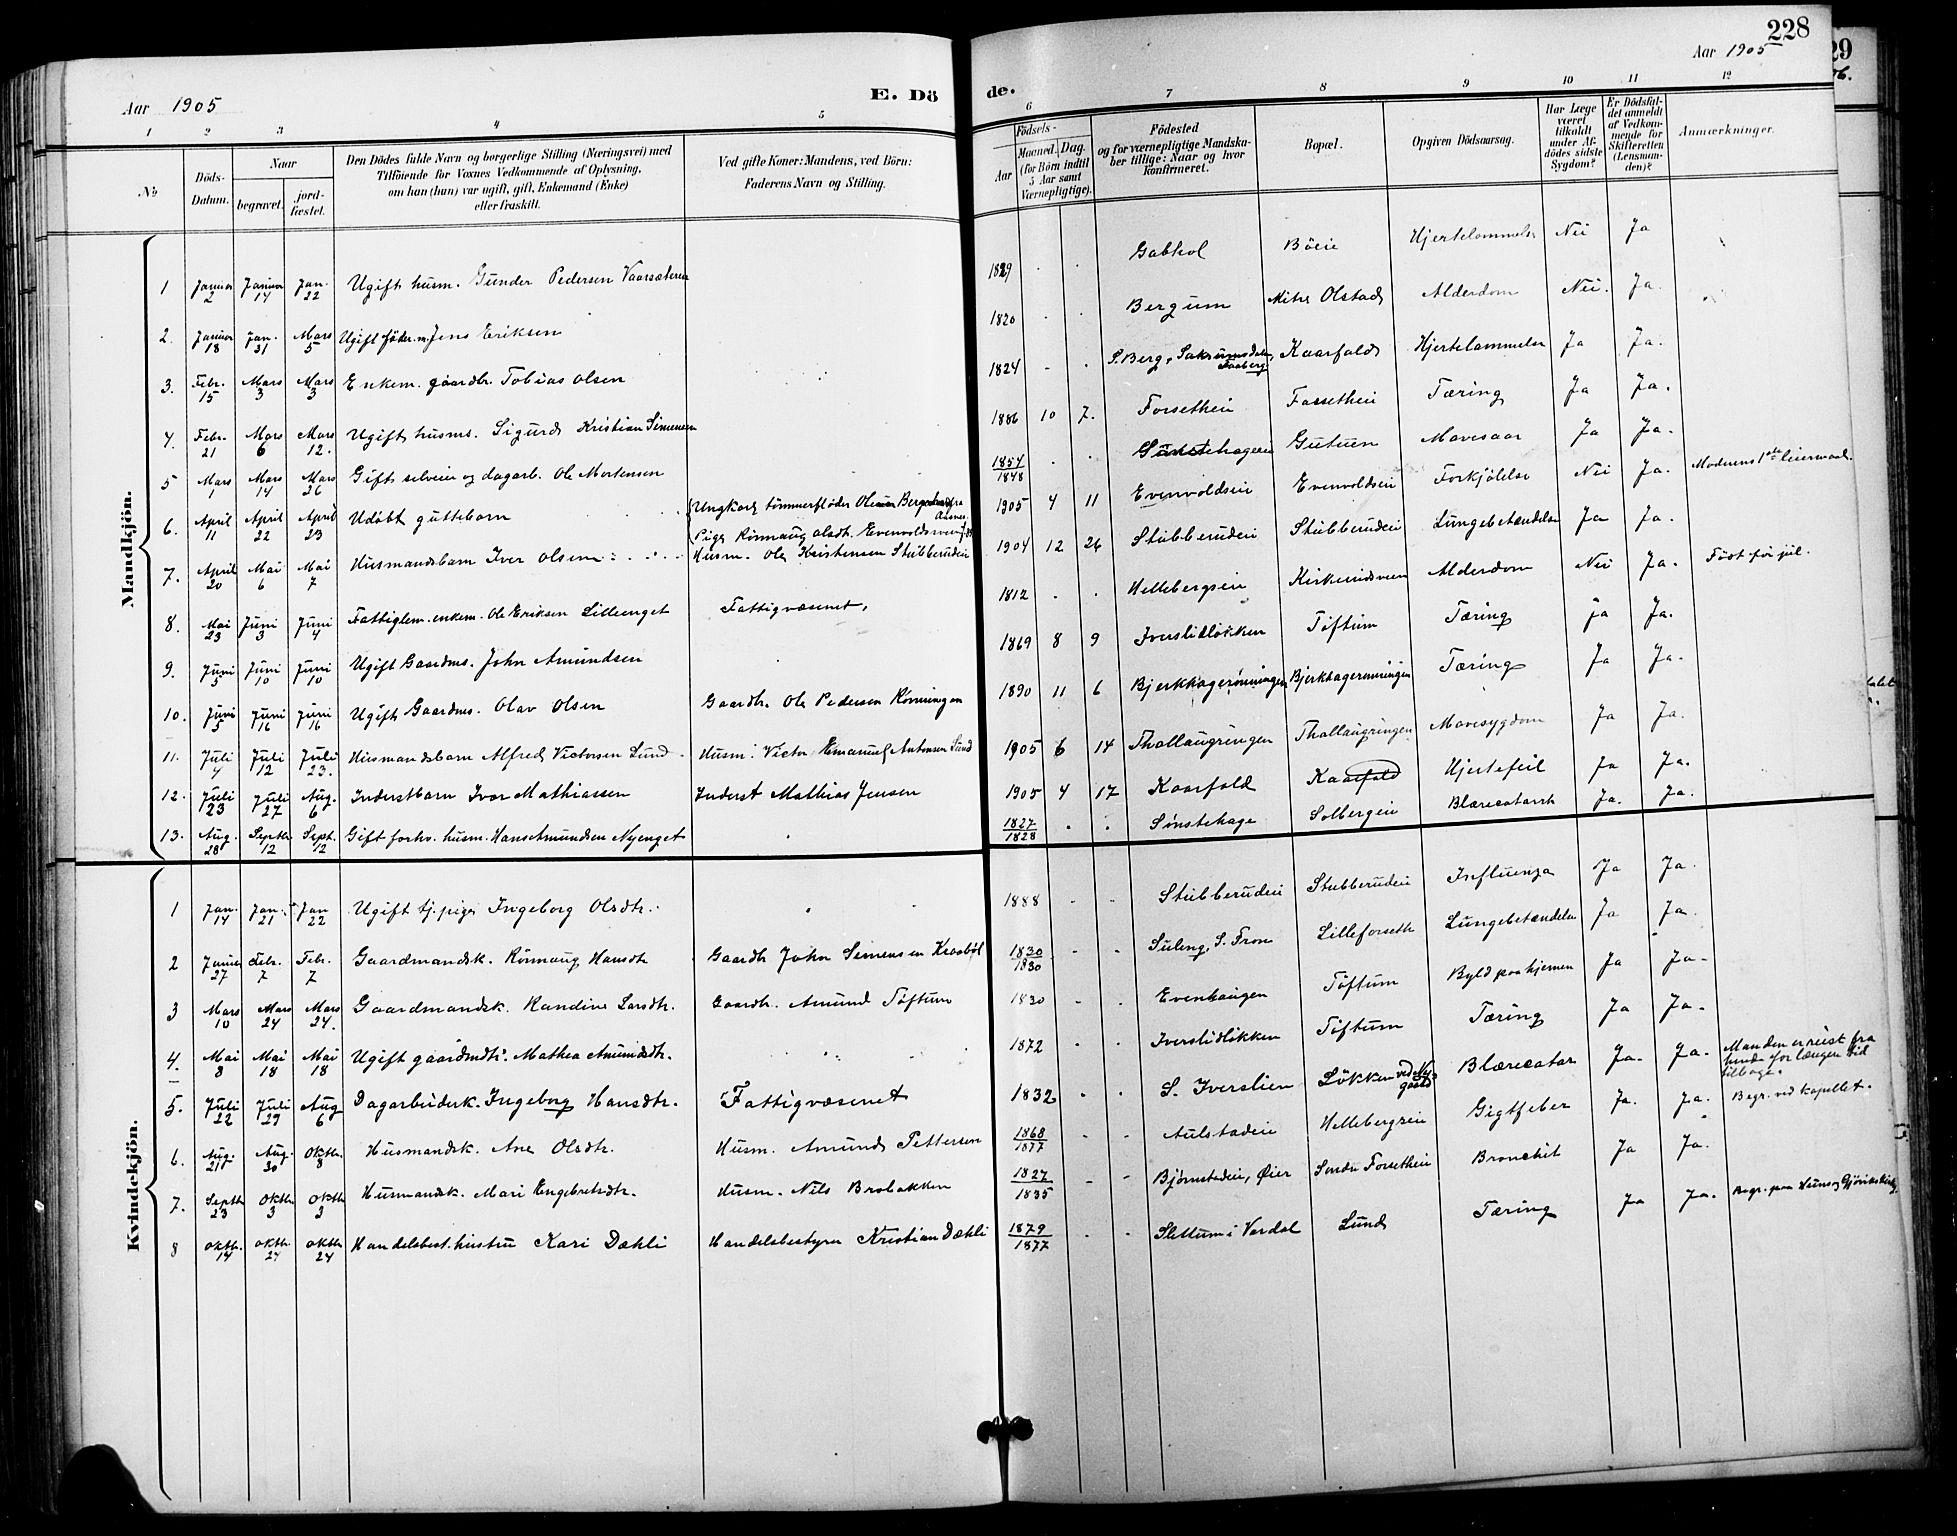 SAH, Vestre Gausdal prestekontor, Klokkerbok nr. 3, 1896-1925, s. 228